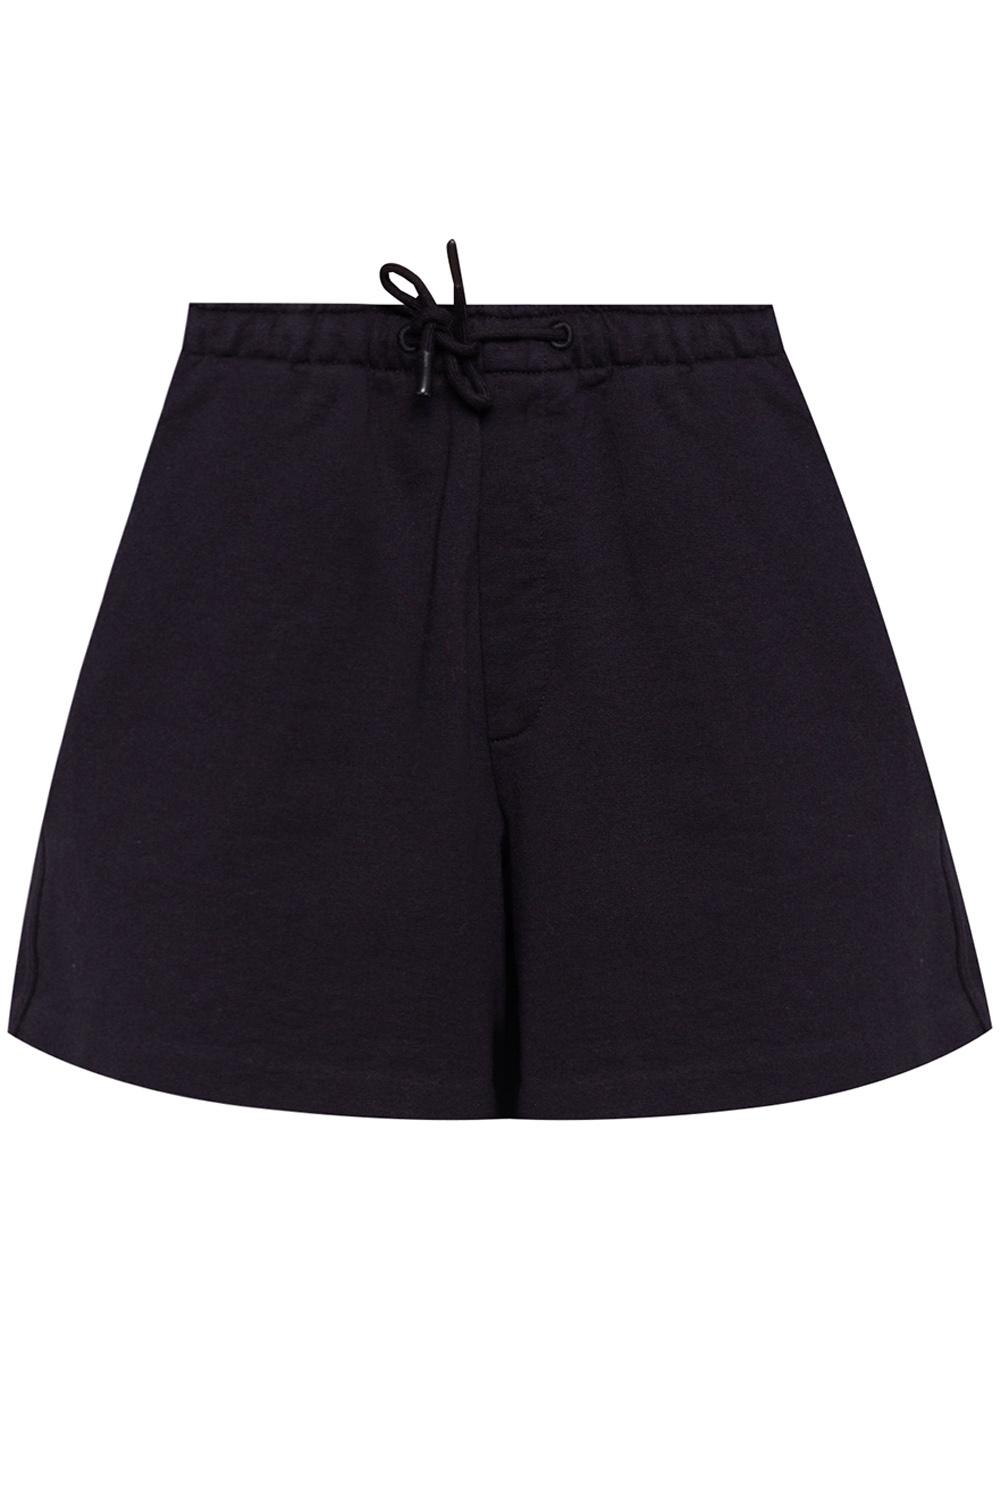 Holzweiler Shorts with logo